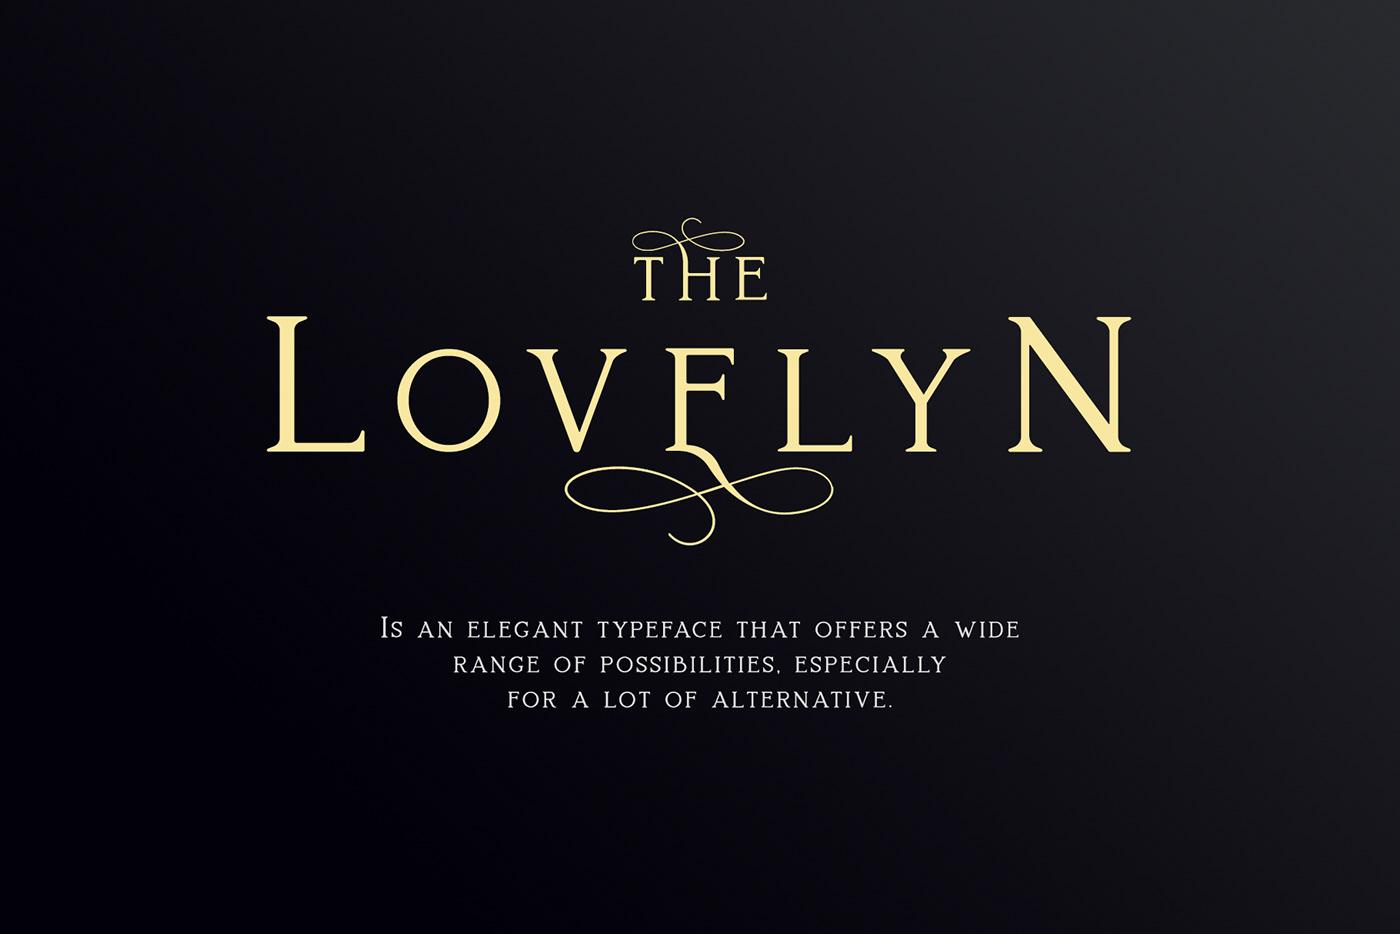 Lovelyn Font (Free Download) on Behance